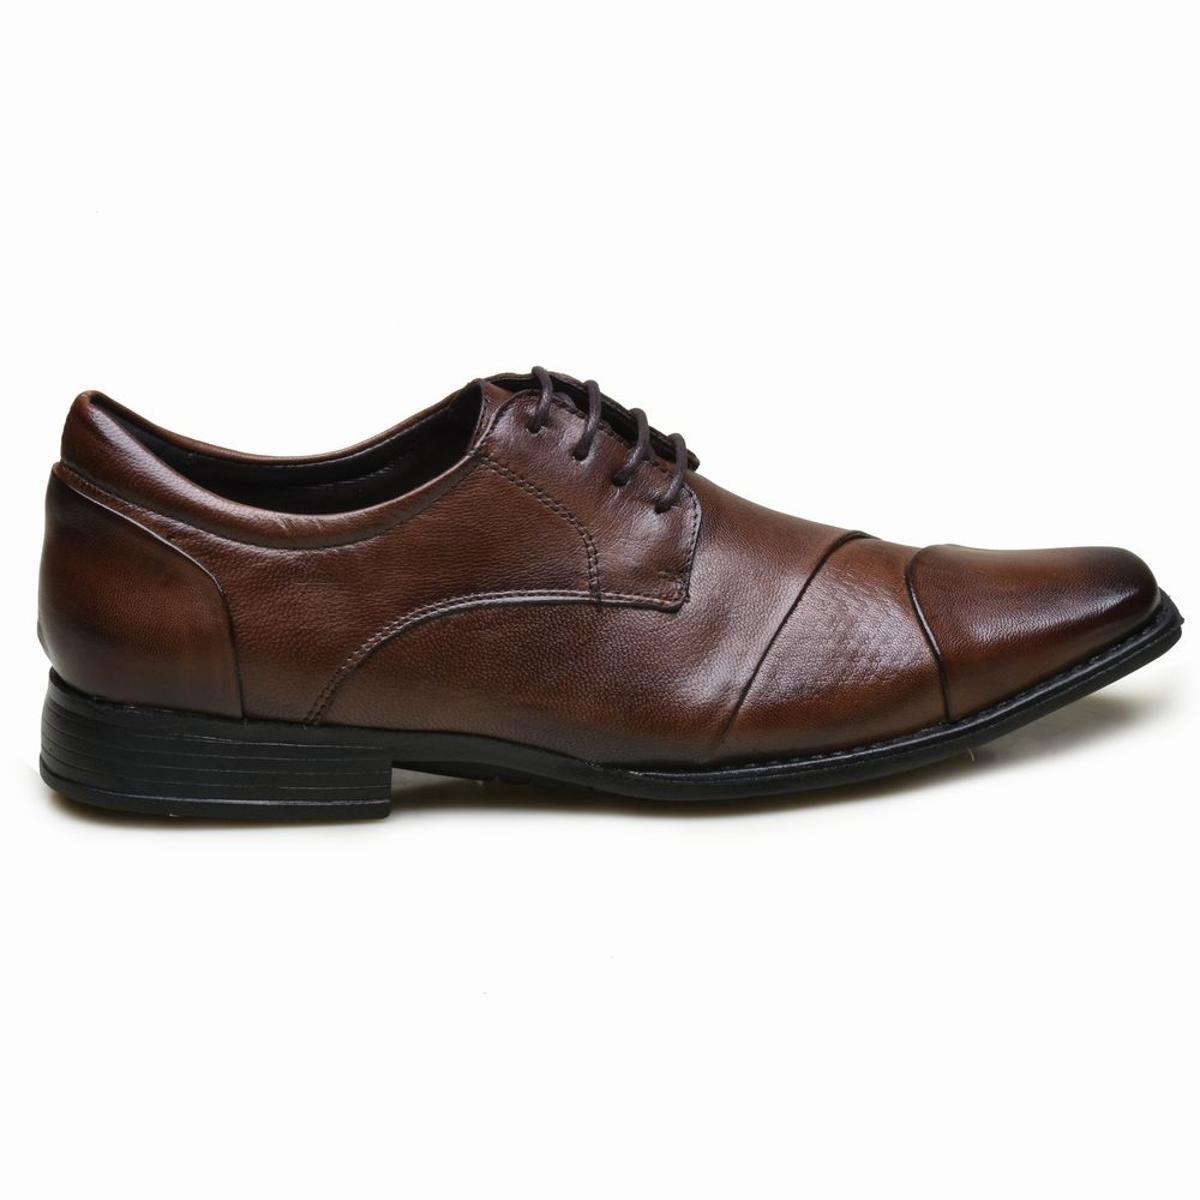 Sapato Marrom Masculino Diplomata Sapato Couro Calvest Social em Social Calvest r4nzawvxrq